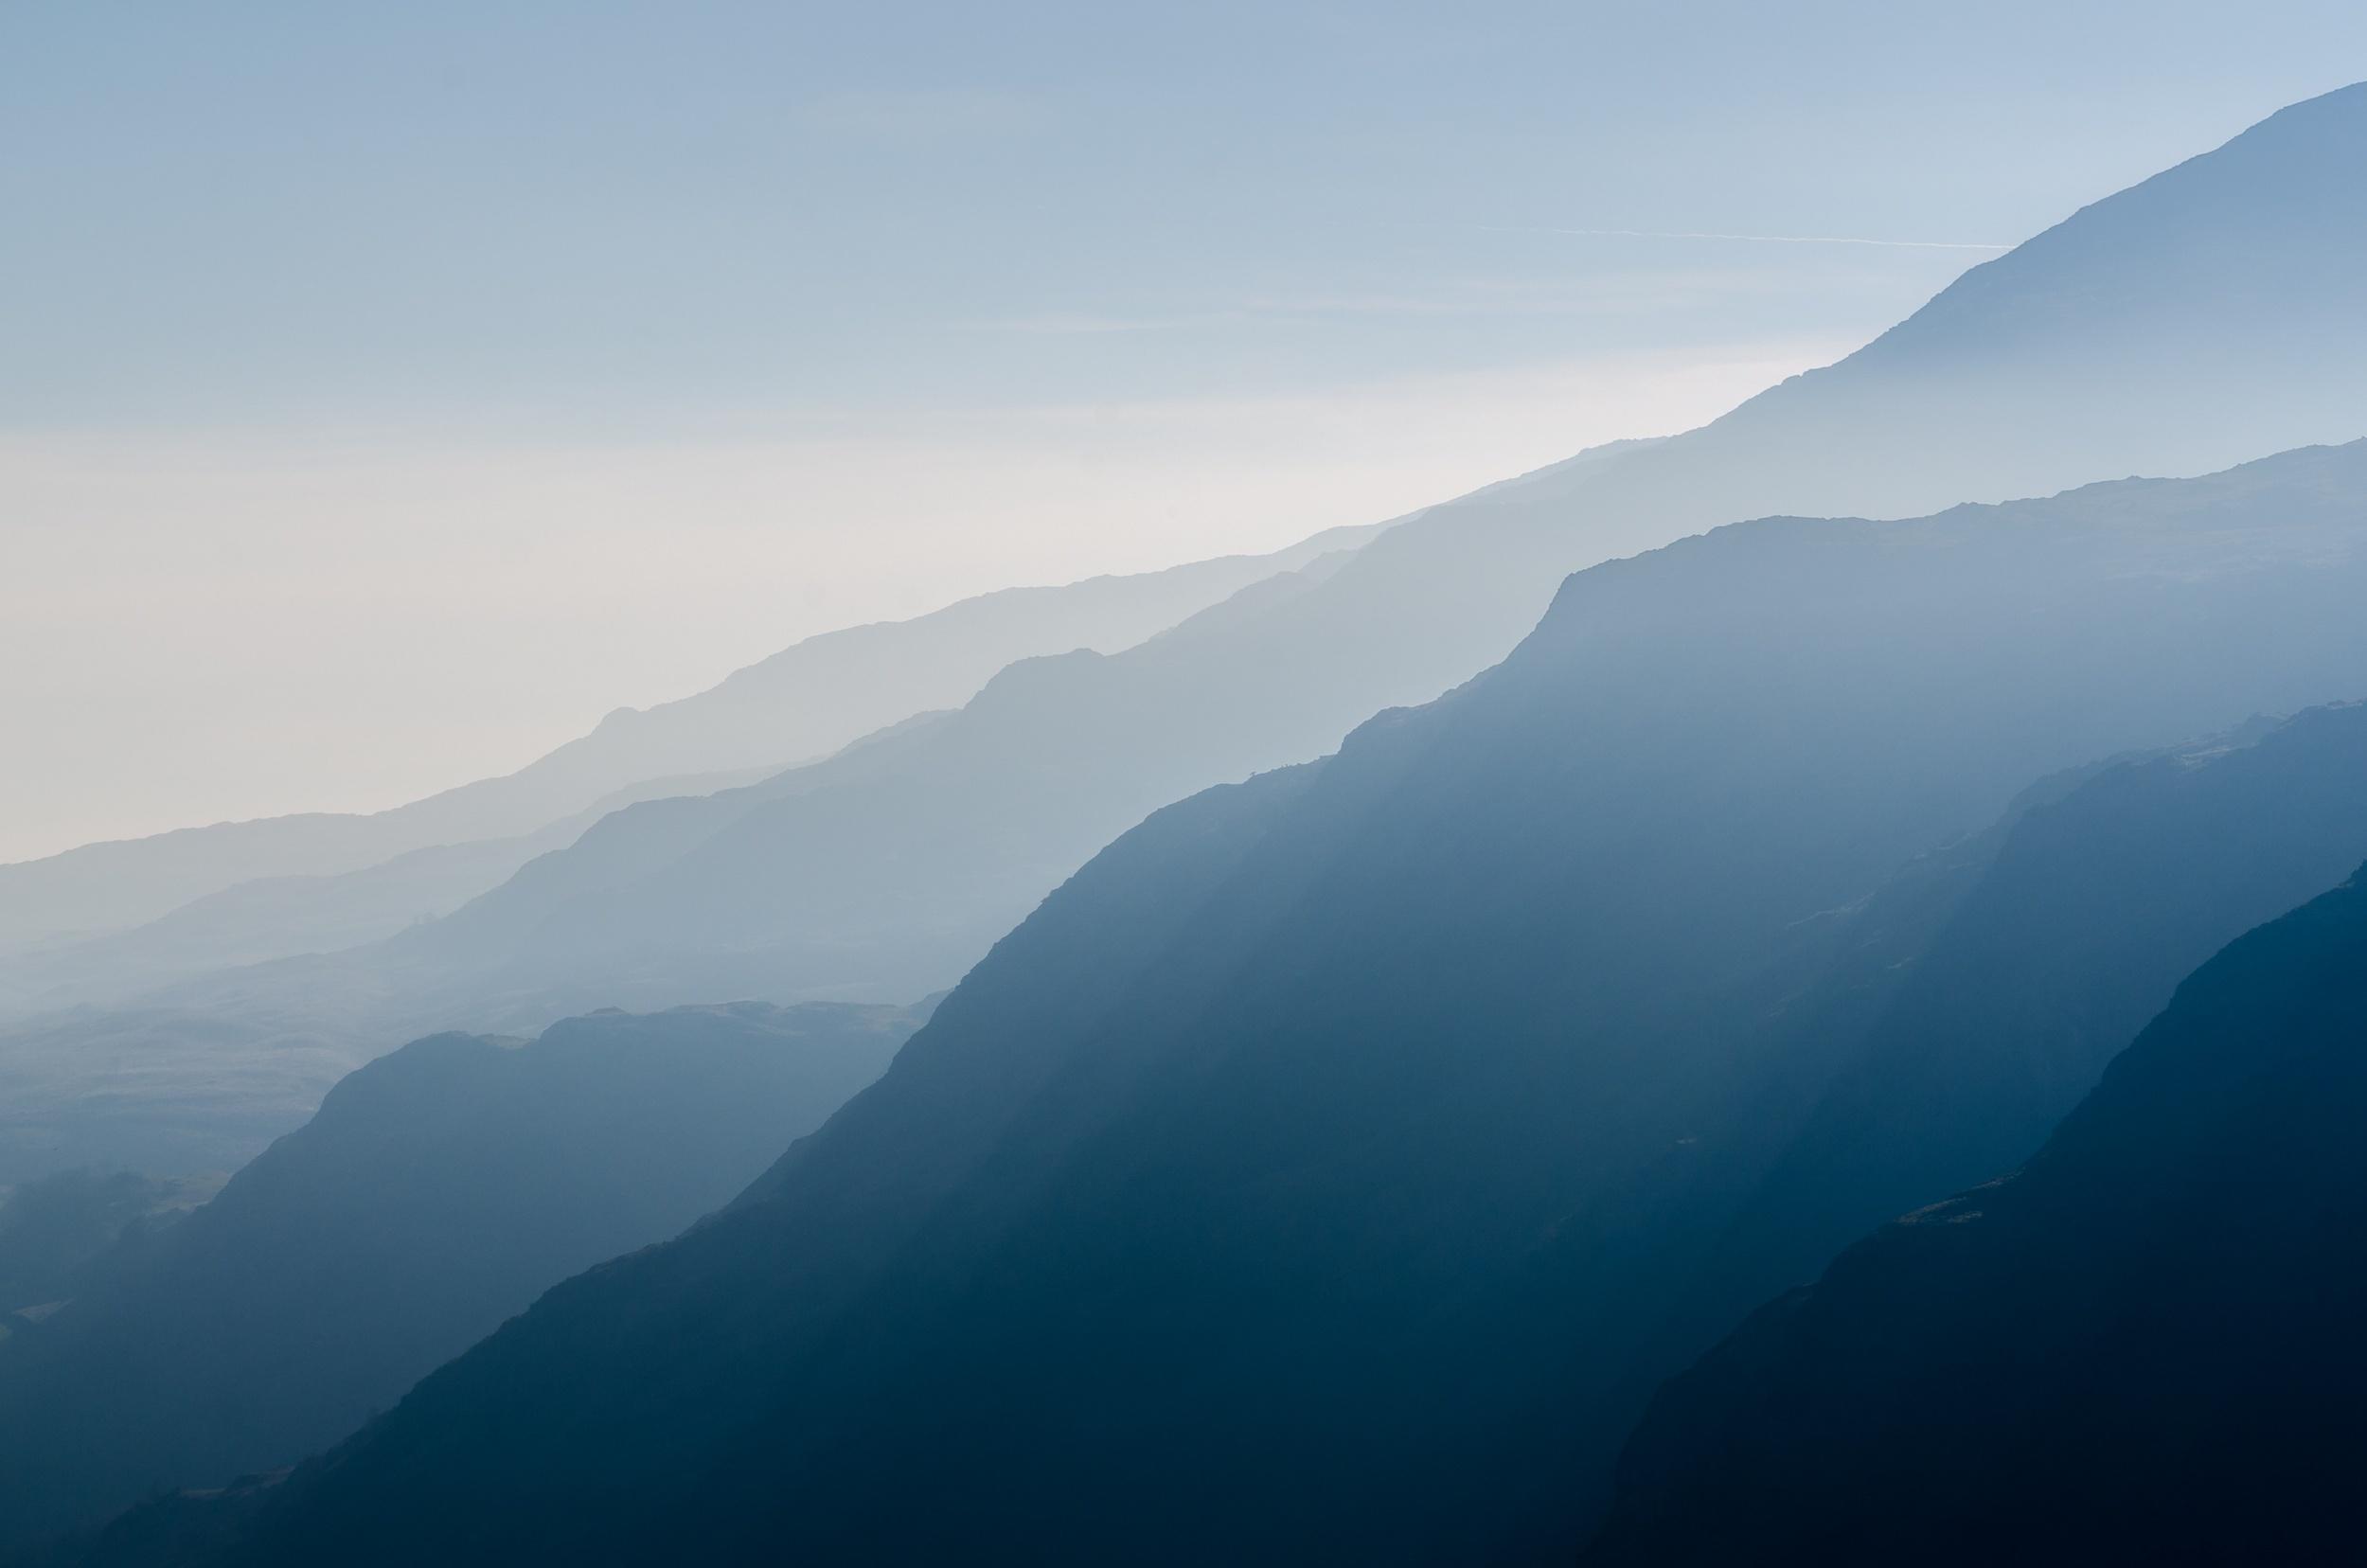 austin-saylor-mountains